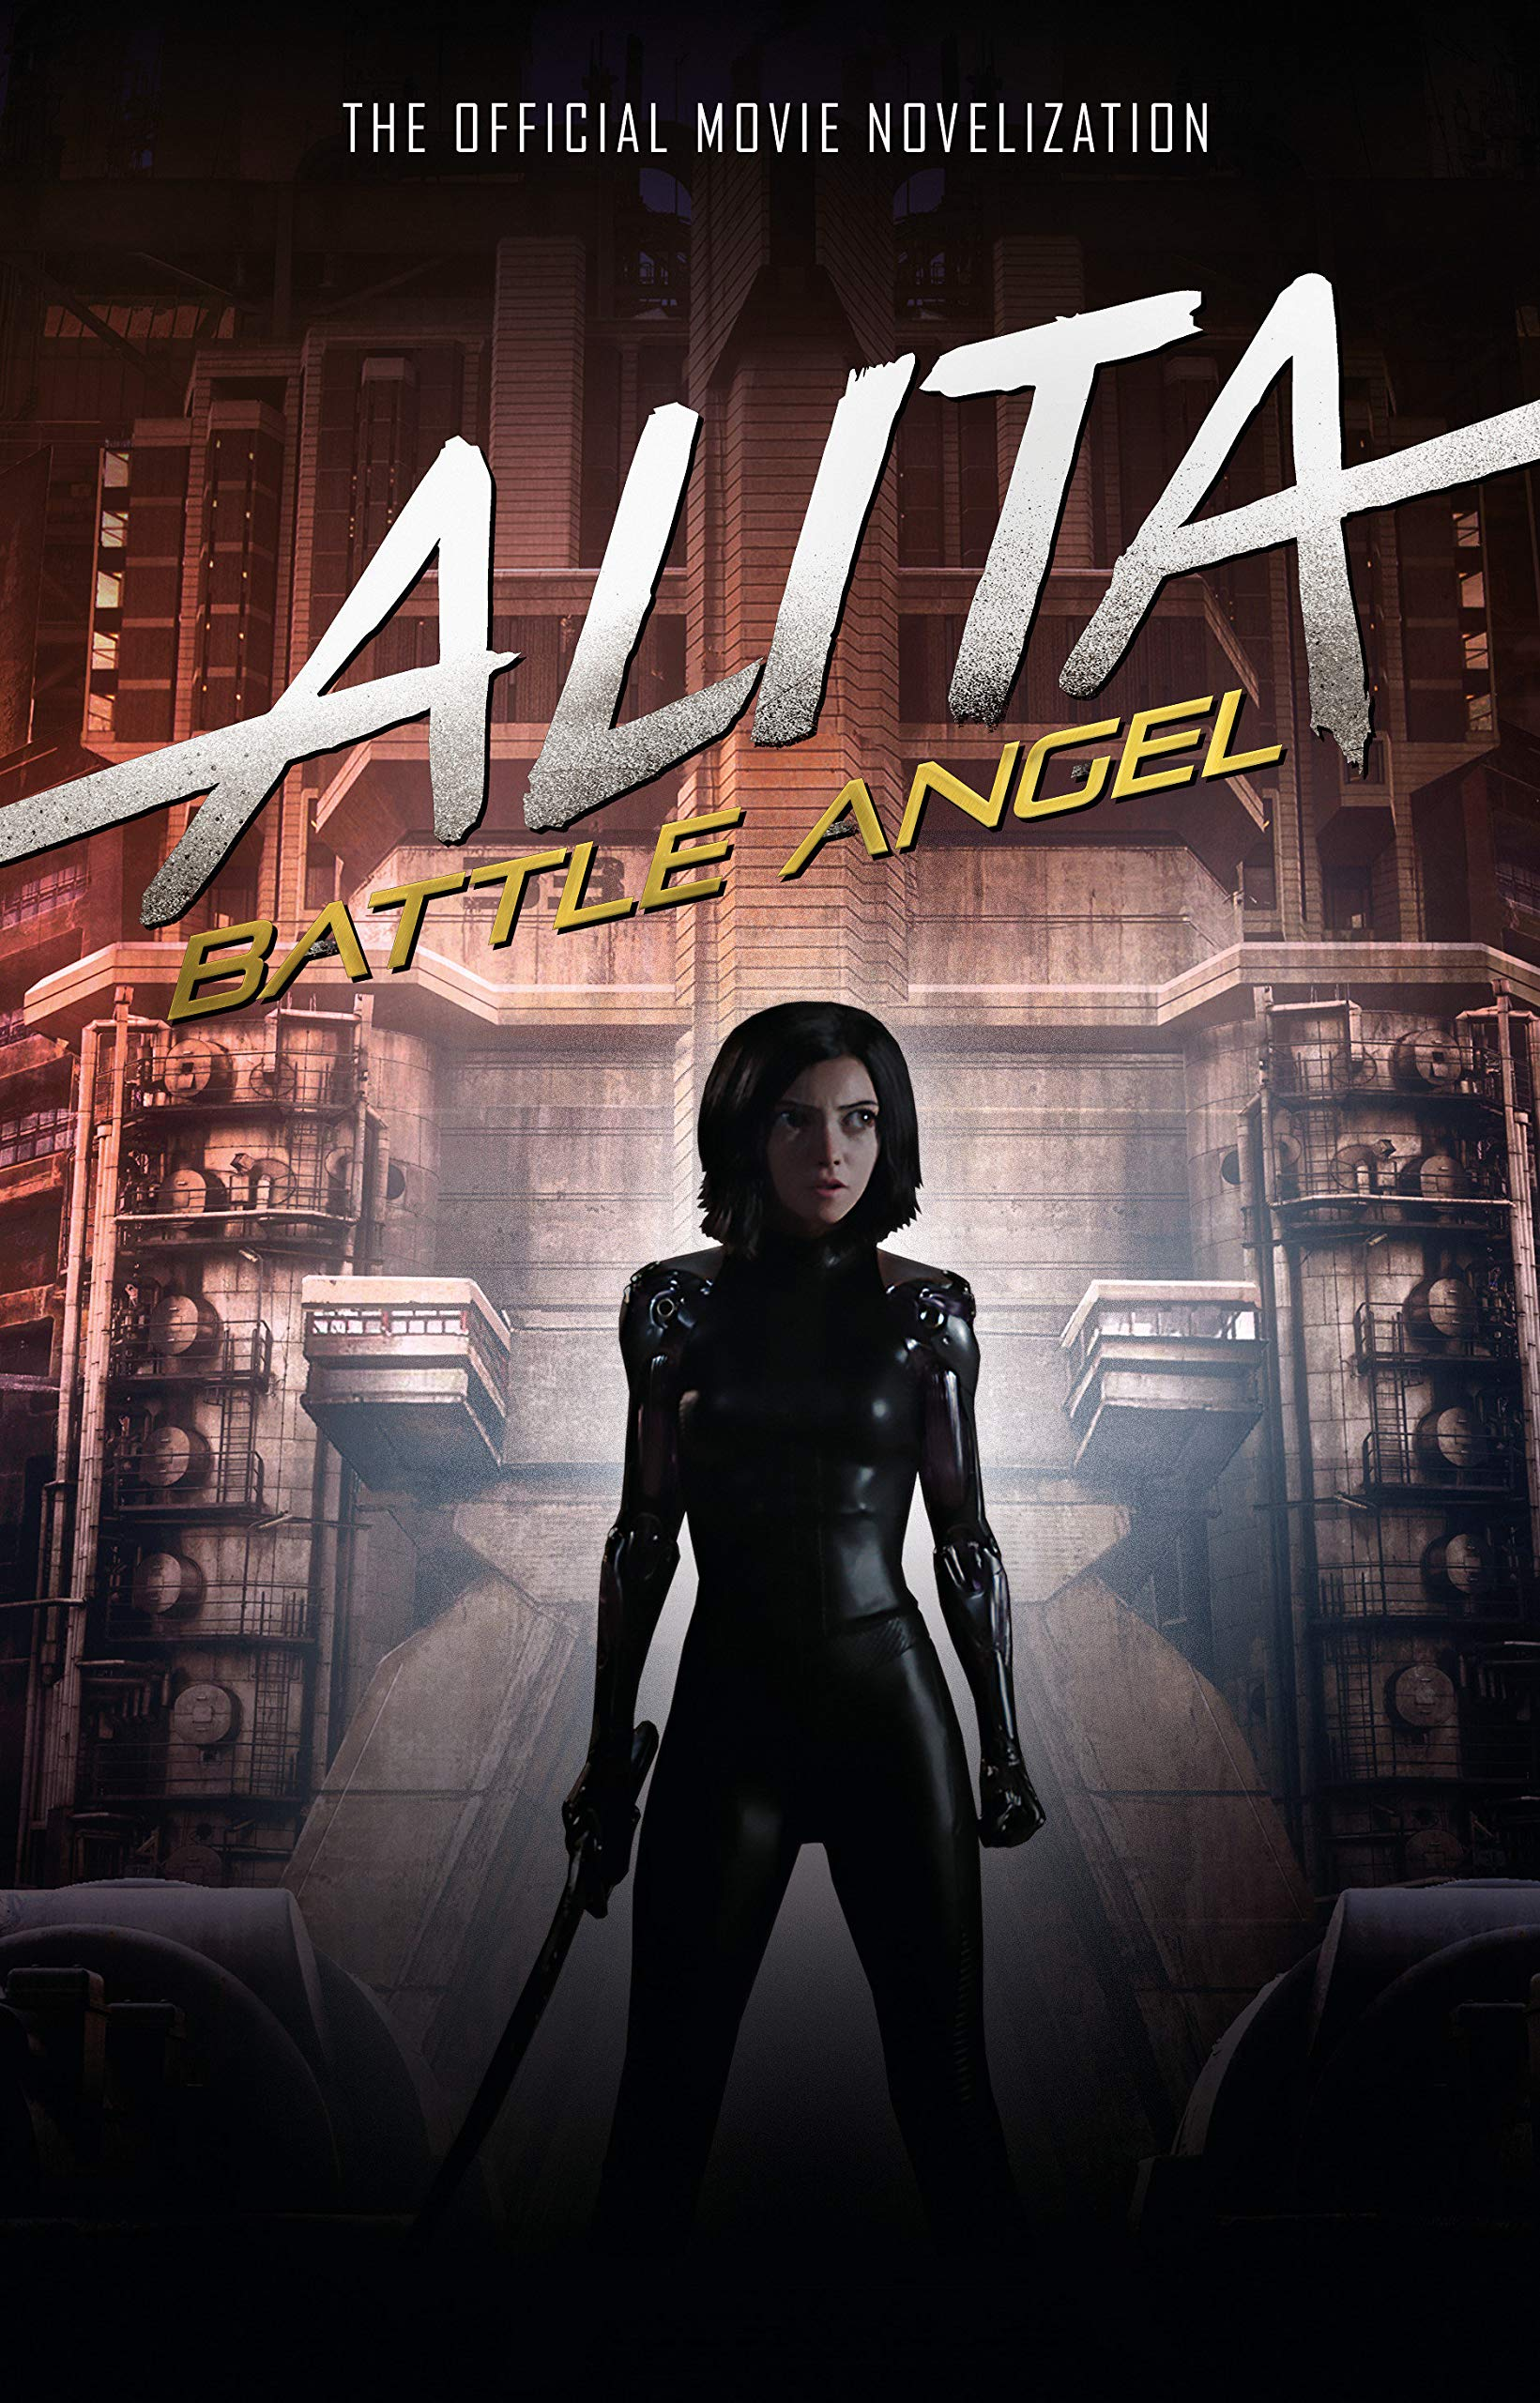 NEW ALITA BATTLE ANGEL V2 2019 OFFICIAL CINEMA MOVIE FILM PRINT PREMIUM POSTER